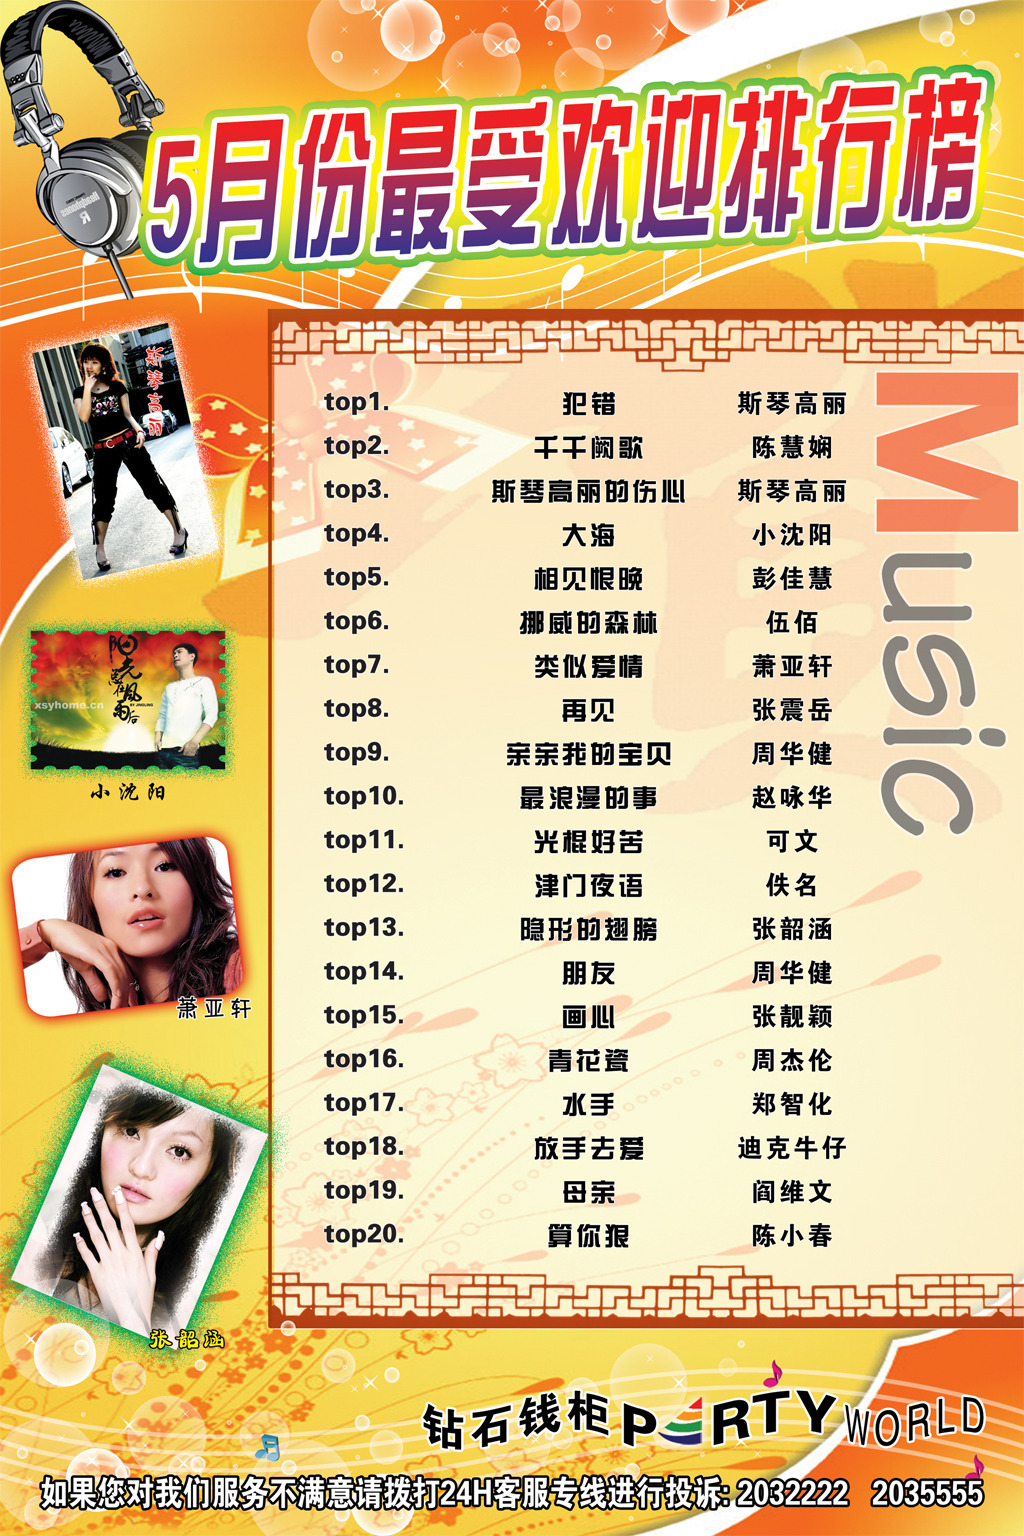 ktv歌曲排行榜模板下载